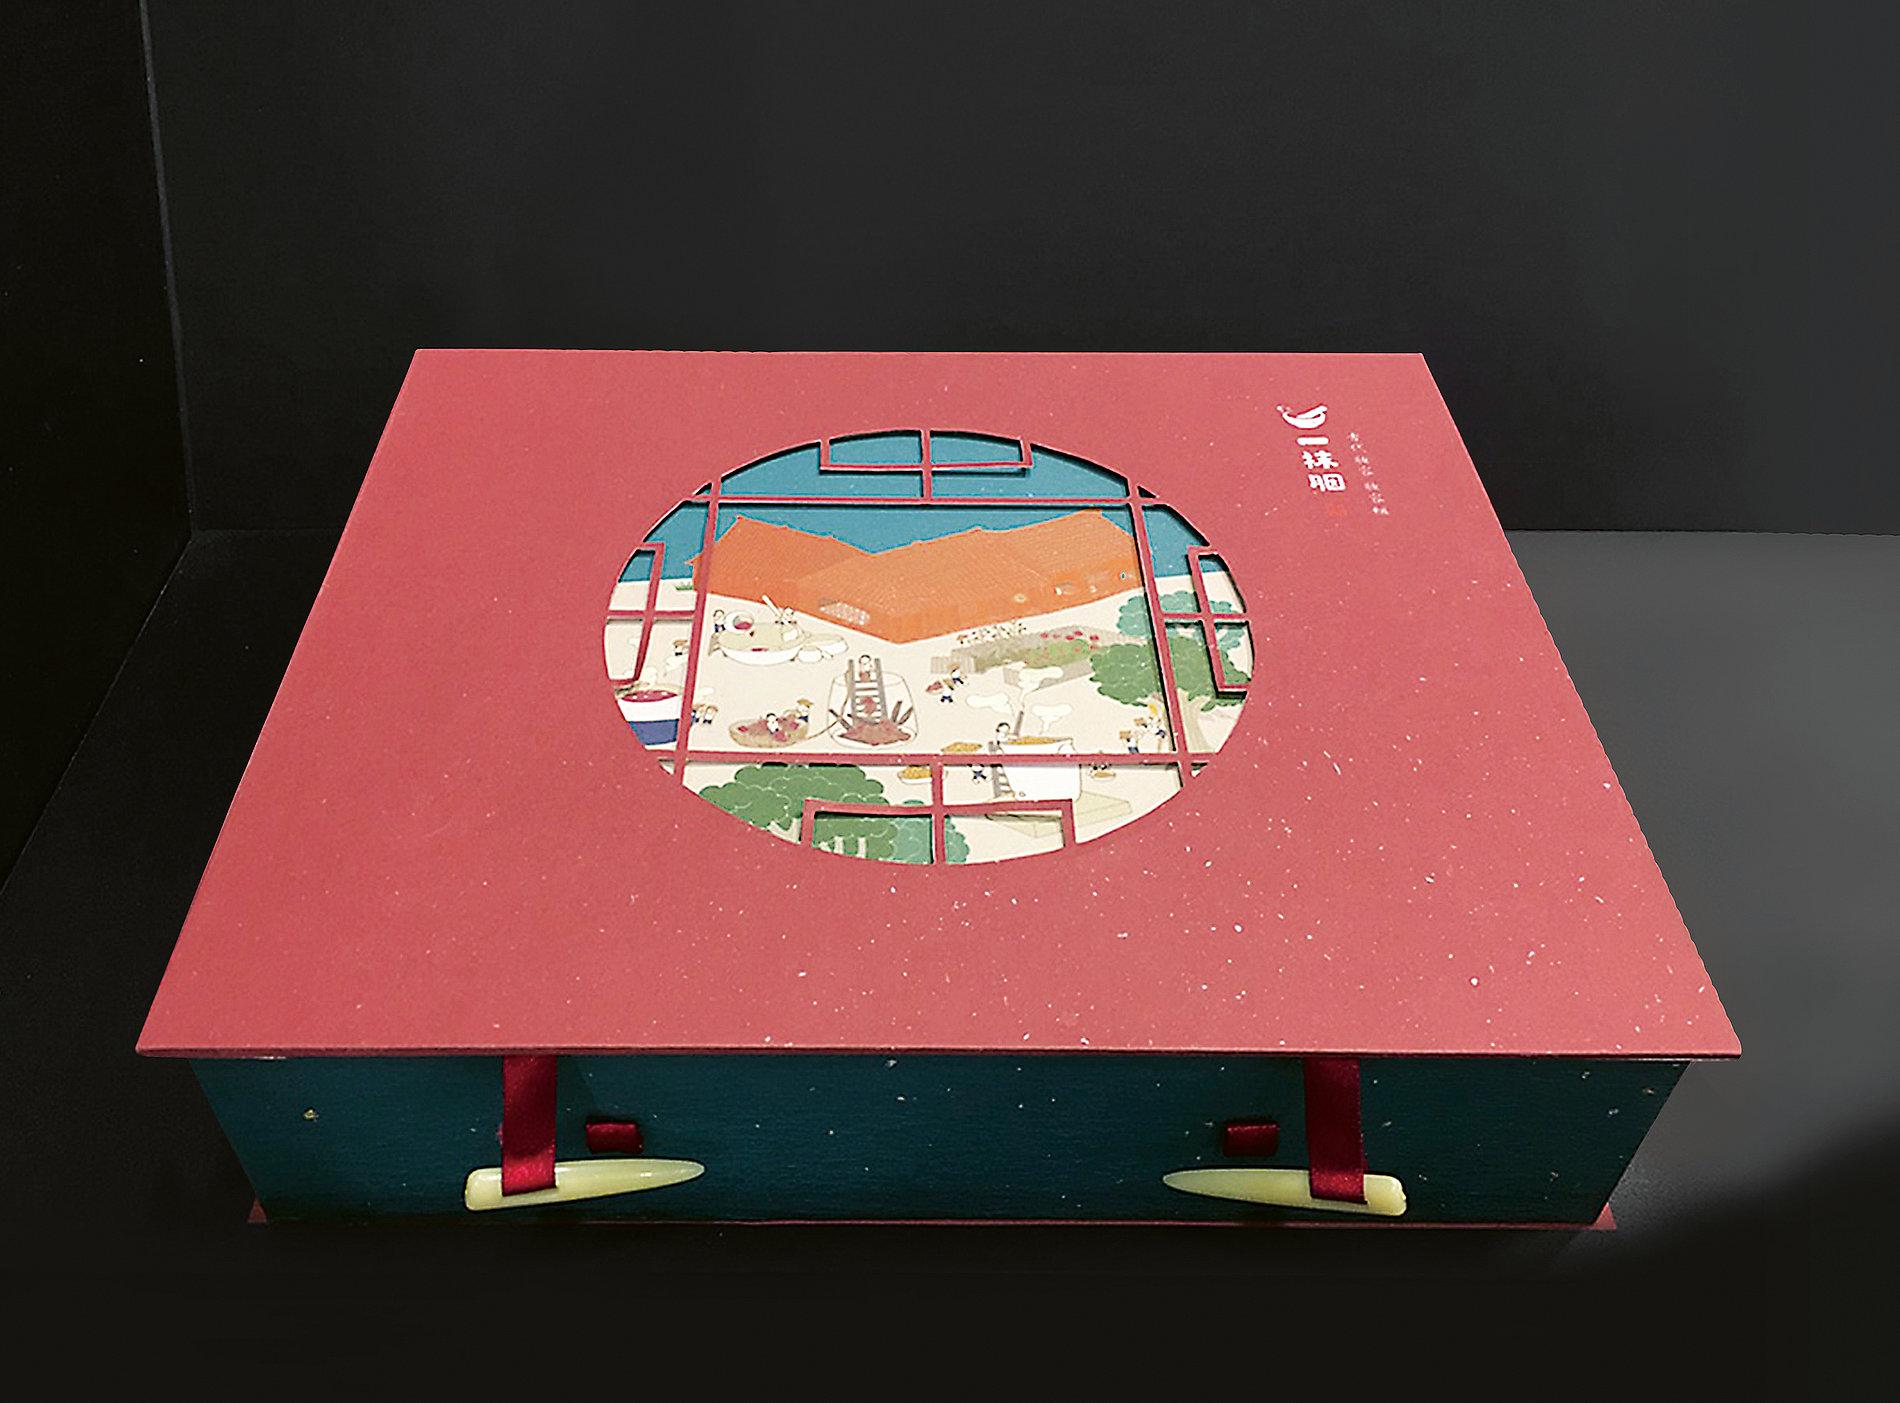 Yi-Mo-Yien | Red Dot Design Award